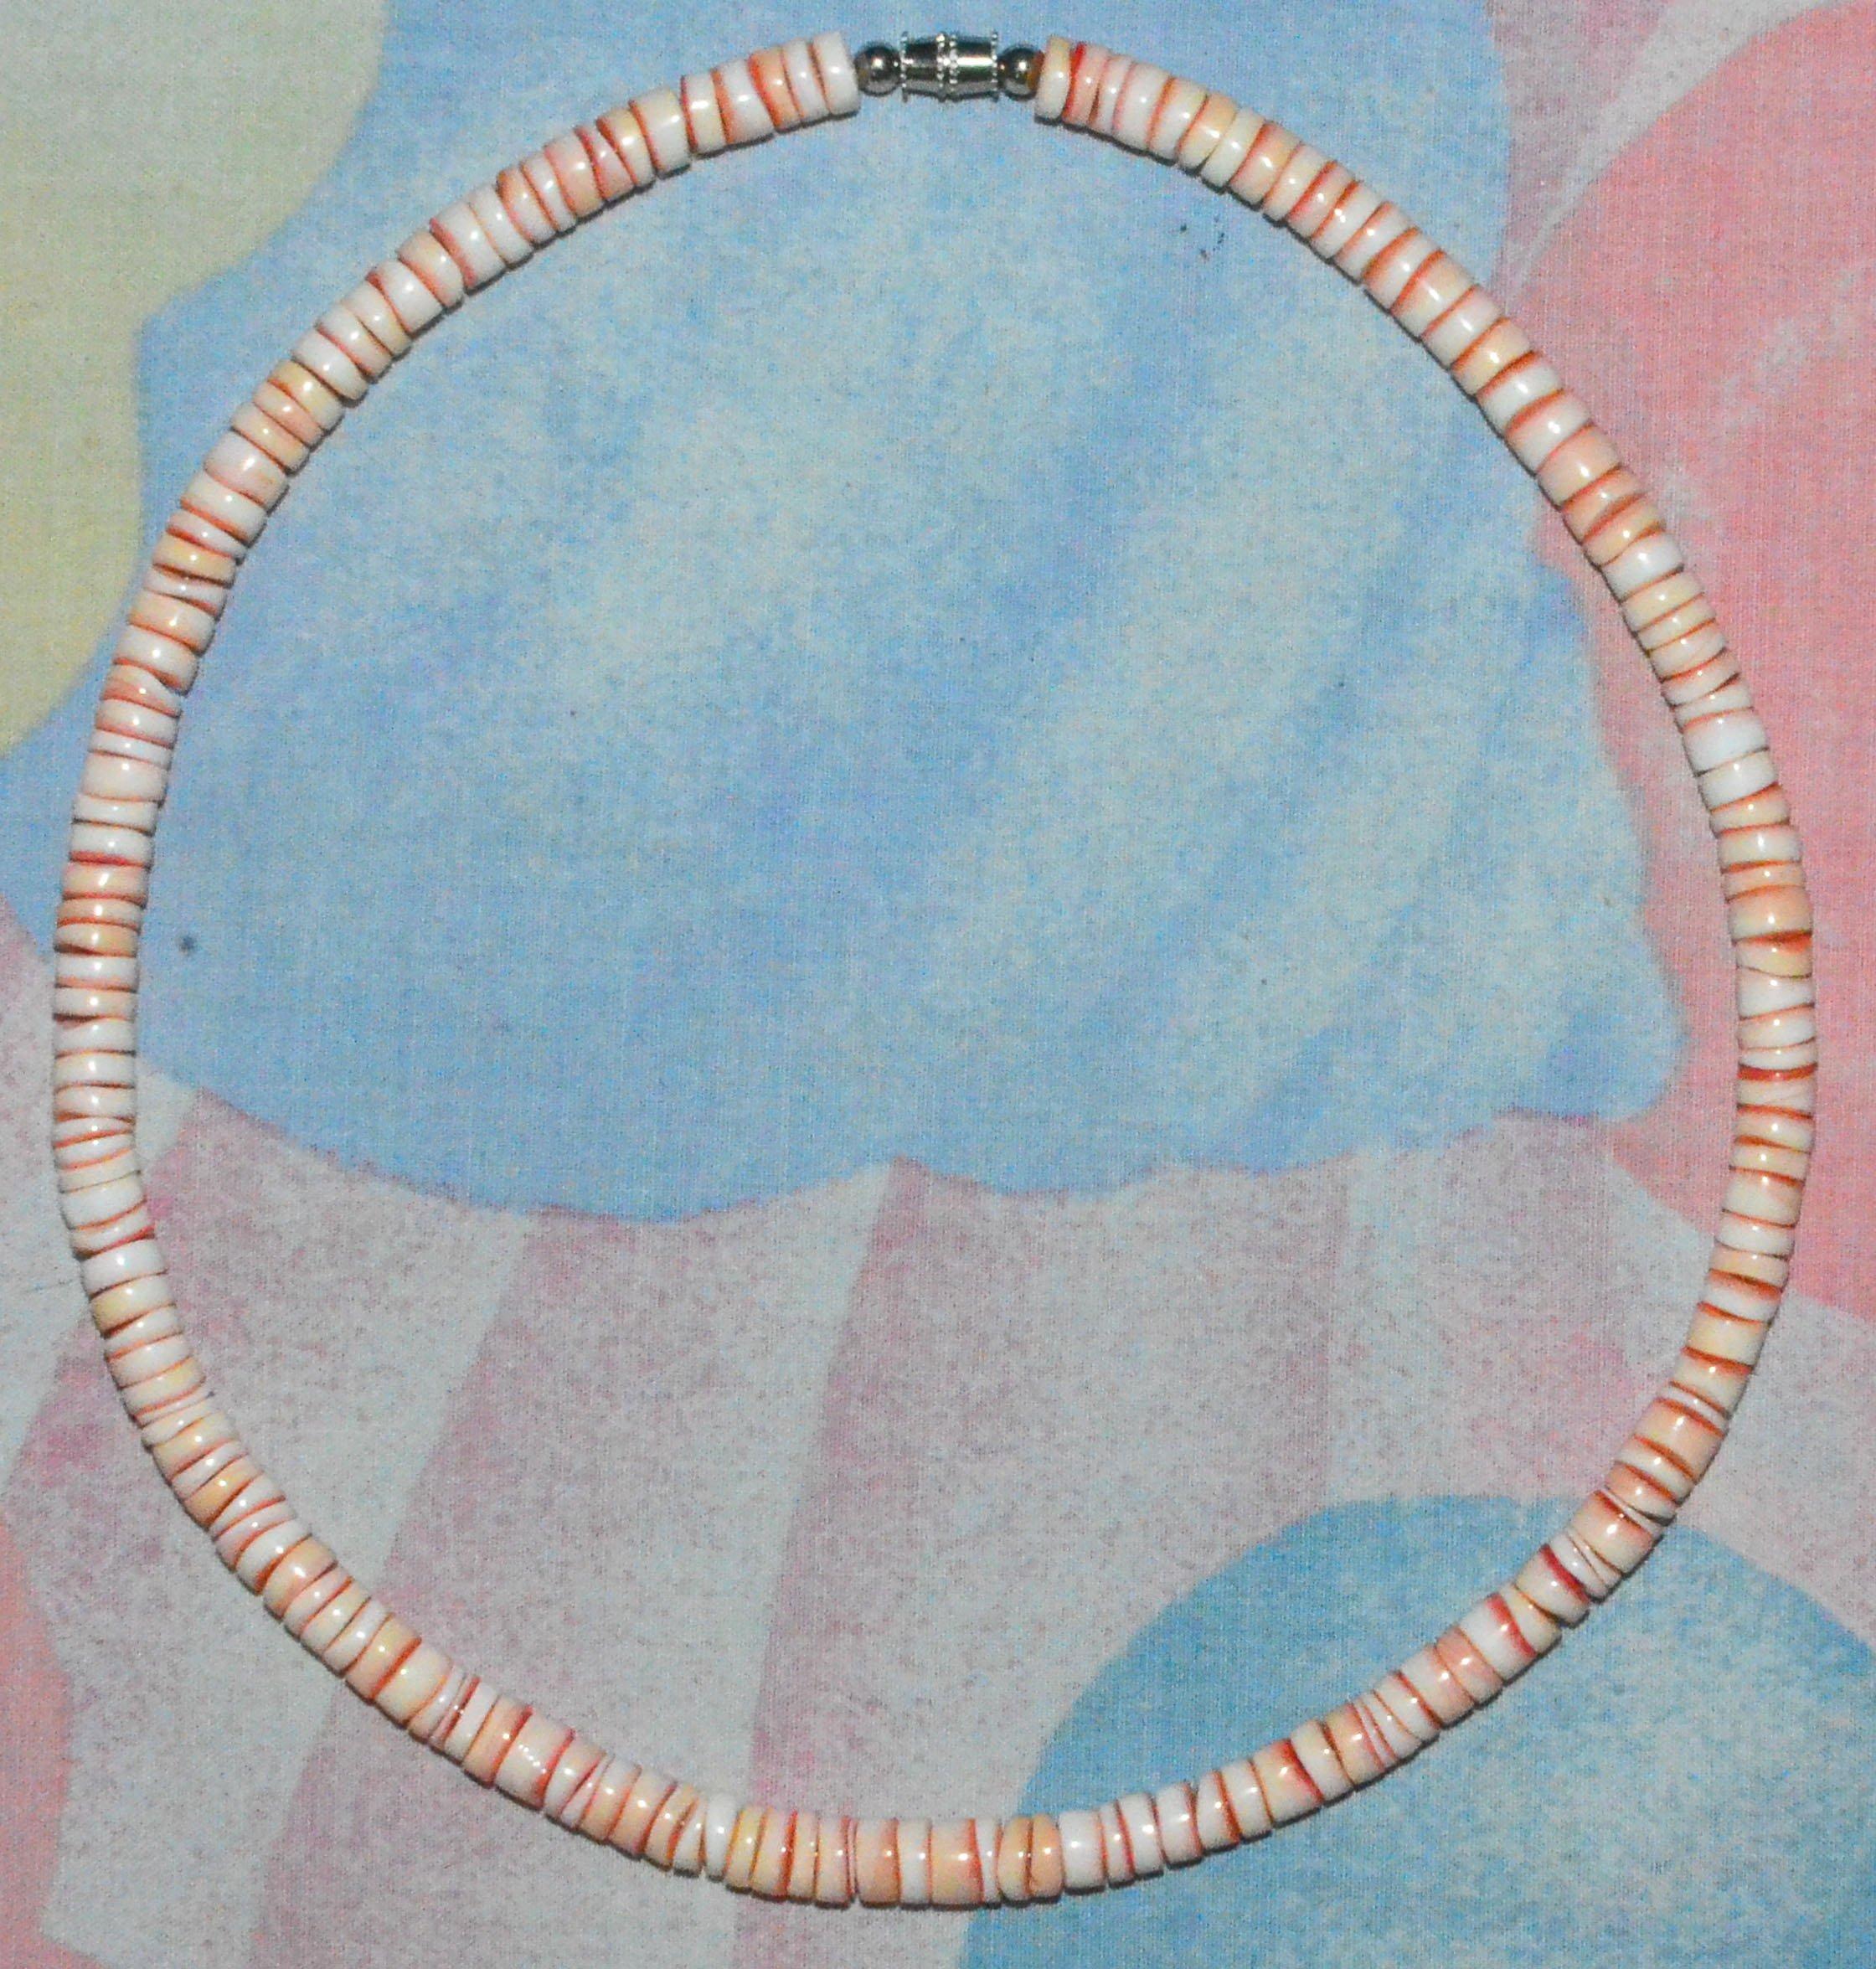 1e3ff844fbffec Get Quotations · Native Treasure - Smooth Pink Puka Shell Necklace Beach  Choker - 6mm - 16